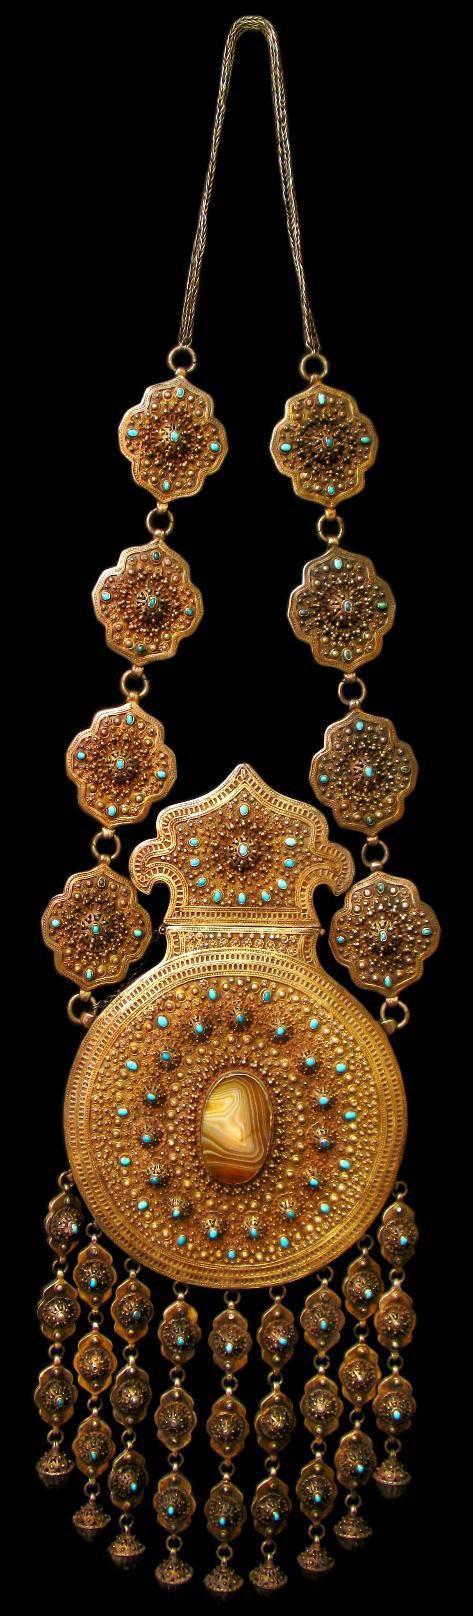 Uzbekistan | Rare Silver Gilt, Turquoise & Agate Equestrian Koranic Amulet Case | 19th century, Emirate of Bukhara | Sold